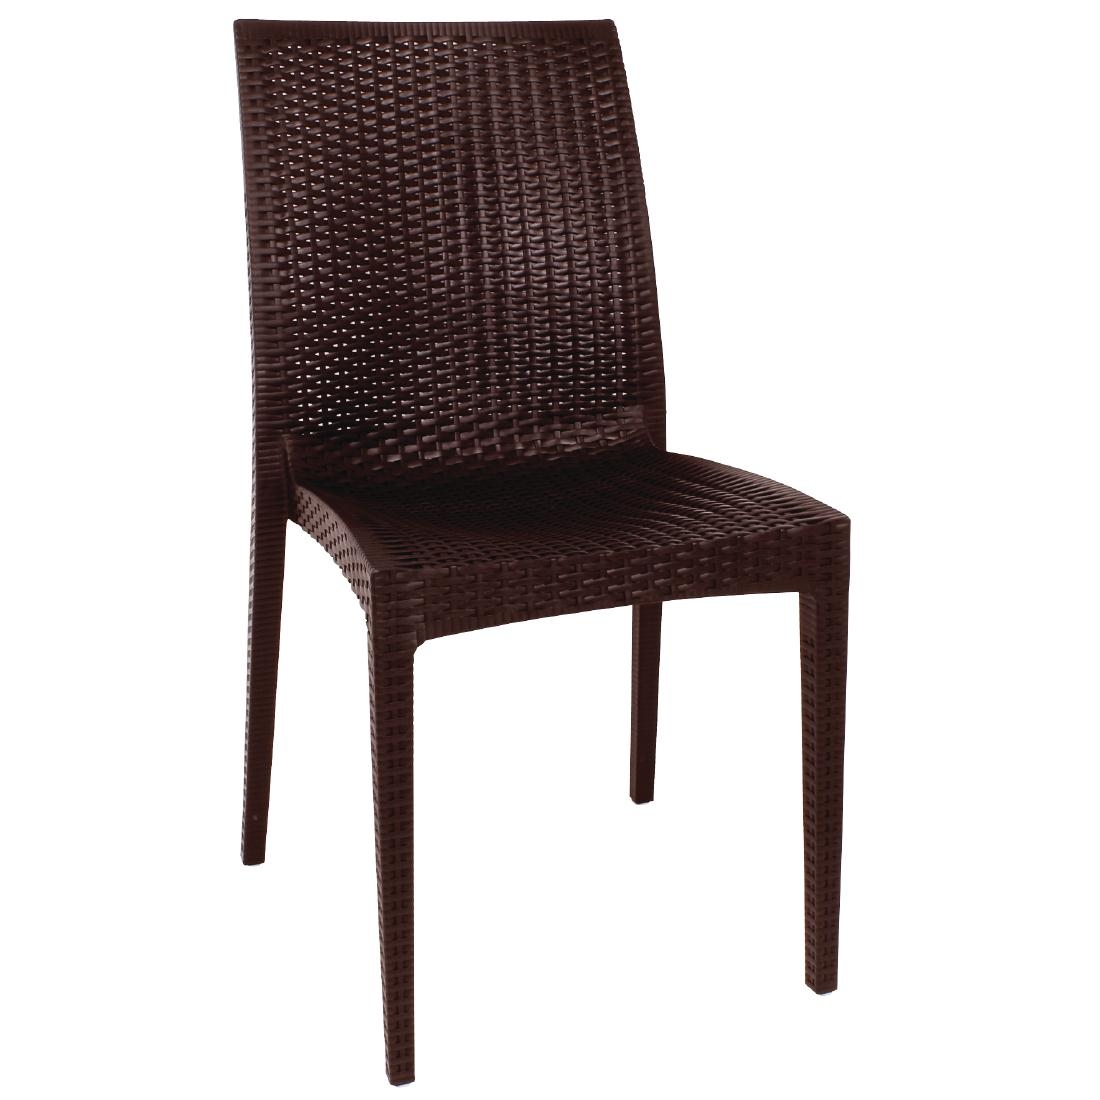 outdoor stuhl krista 190st braun g nstig kaufen m bel star. Black Bedroom Furniture Sets. Home Design Ideas